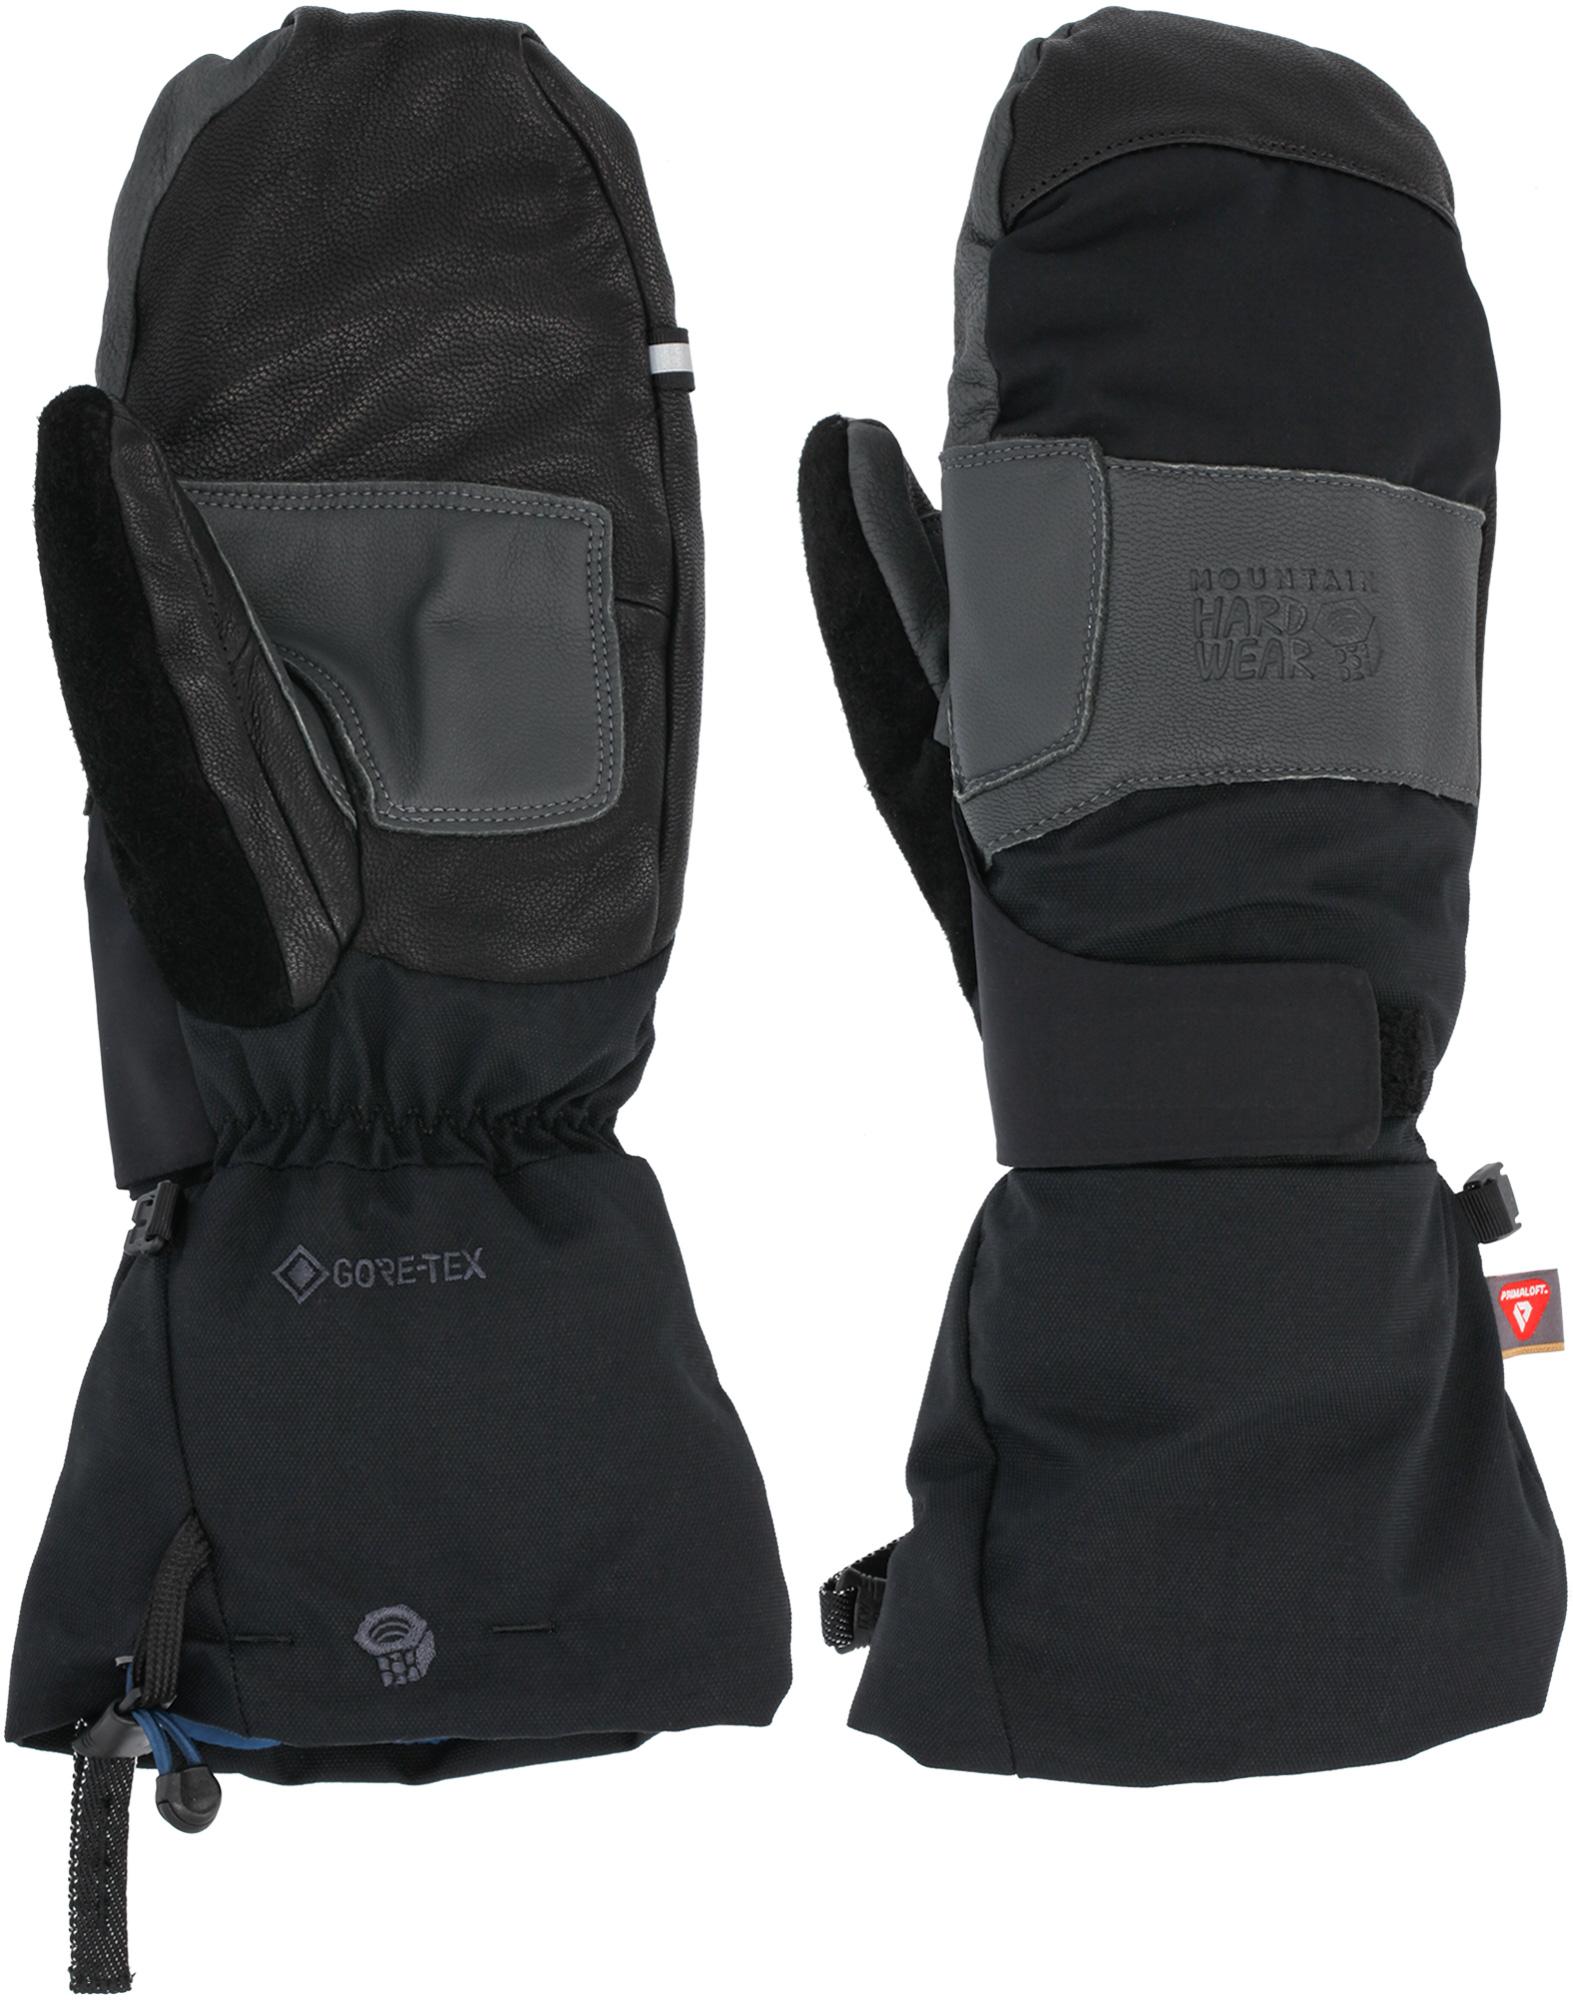 сапоги армейские haix 100501 c1 gore tex Mountain Hardwear Варежки Mountain Hardwear High Exposure™ Gore-Tex, размер M